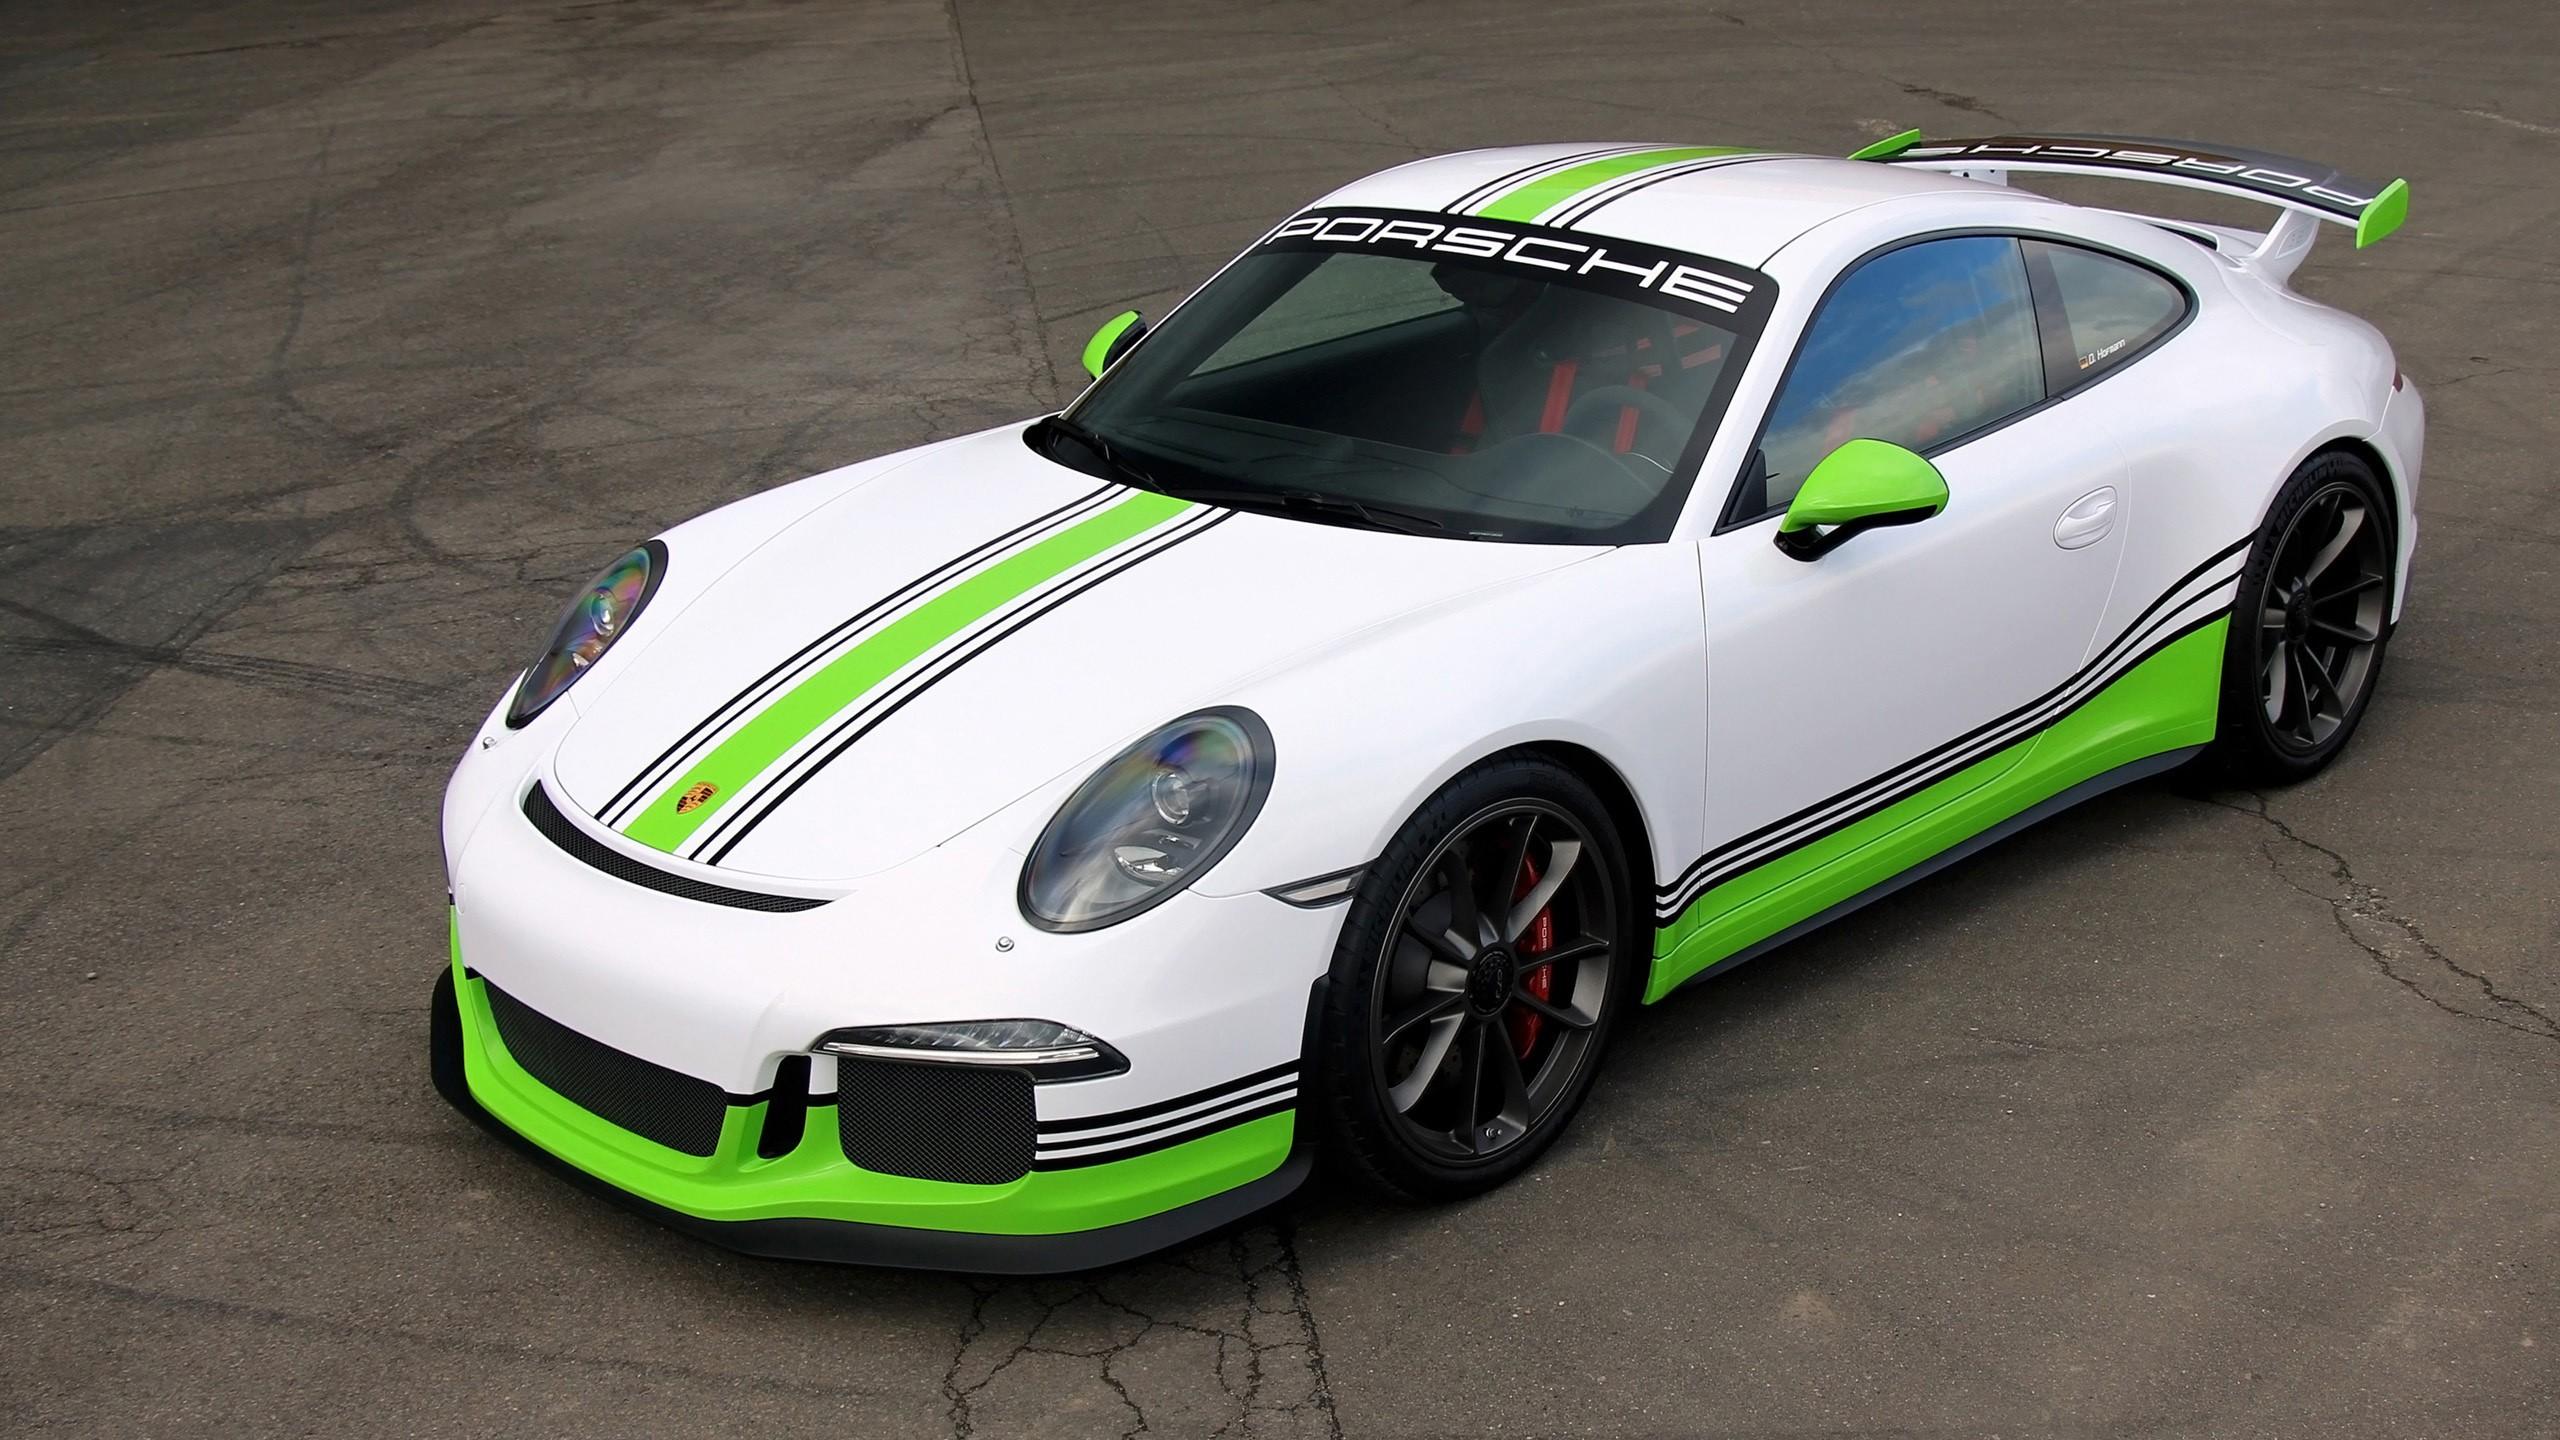 Electric Blue Wallpaper Hd 2014 Fostla De Porsche 991 Gt3 Wallpaper Hd Car